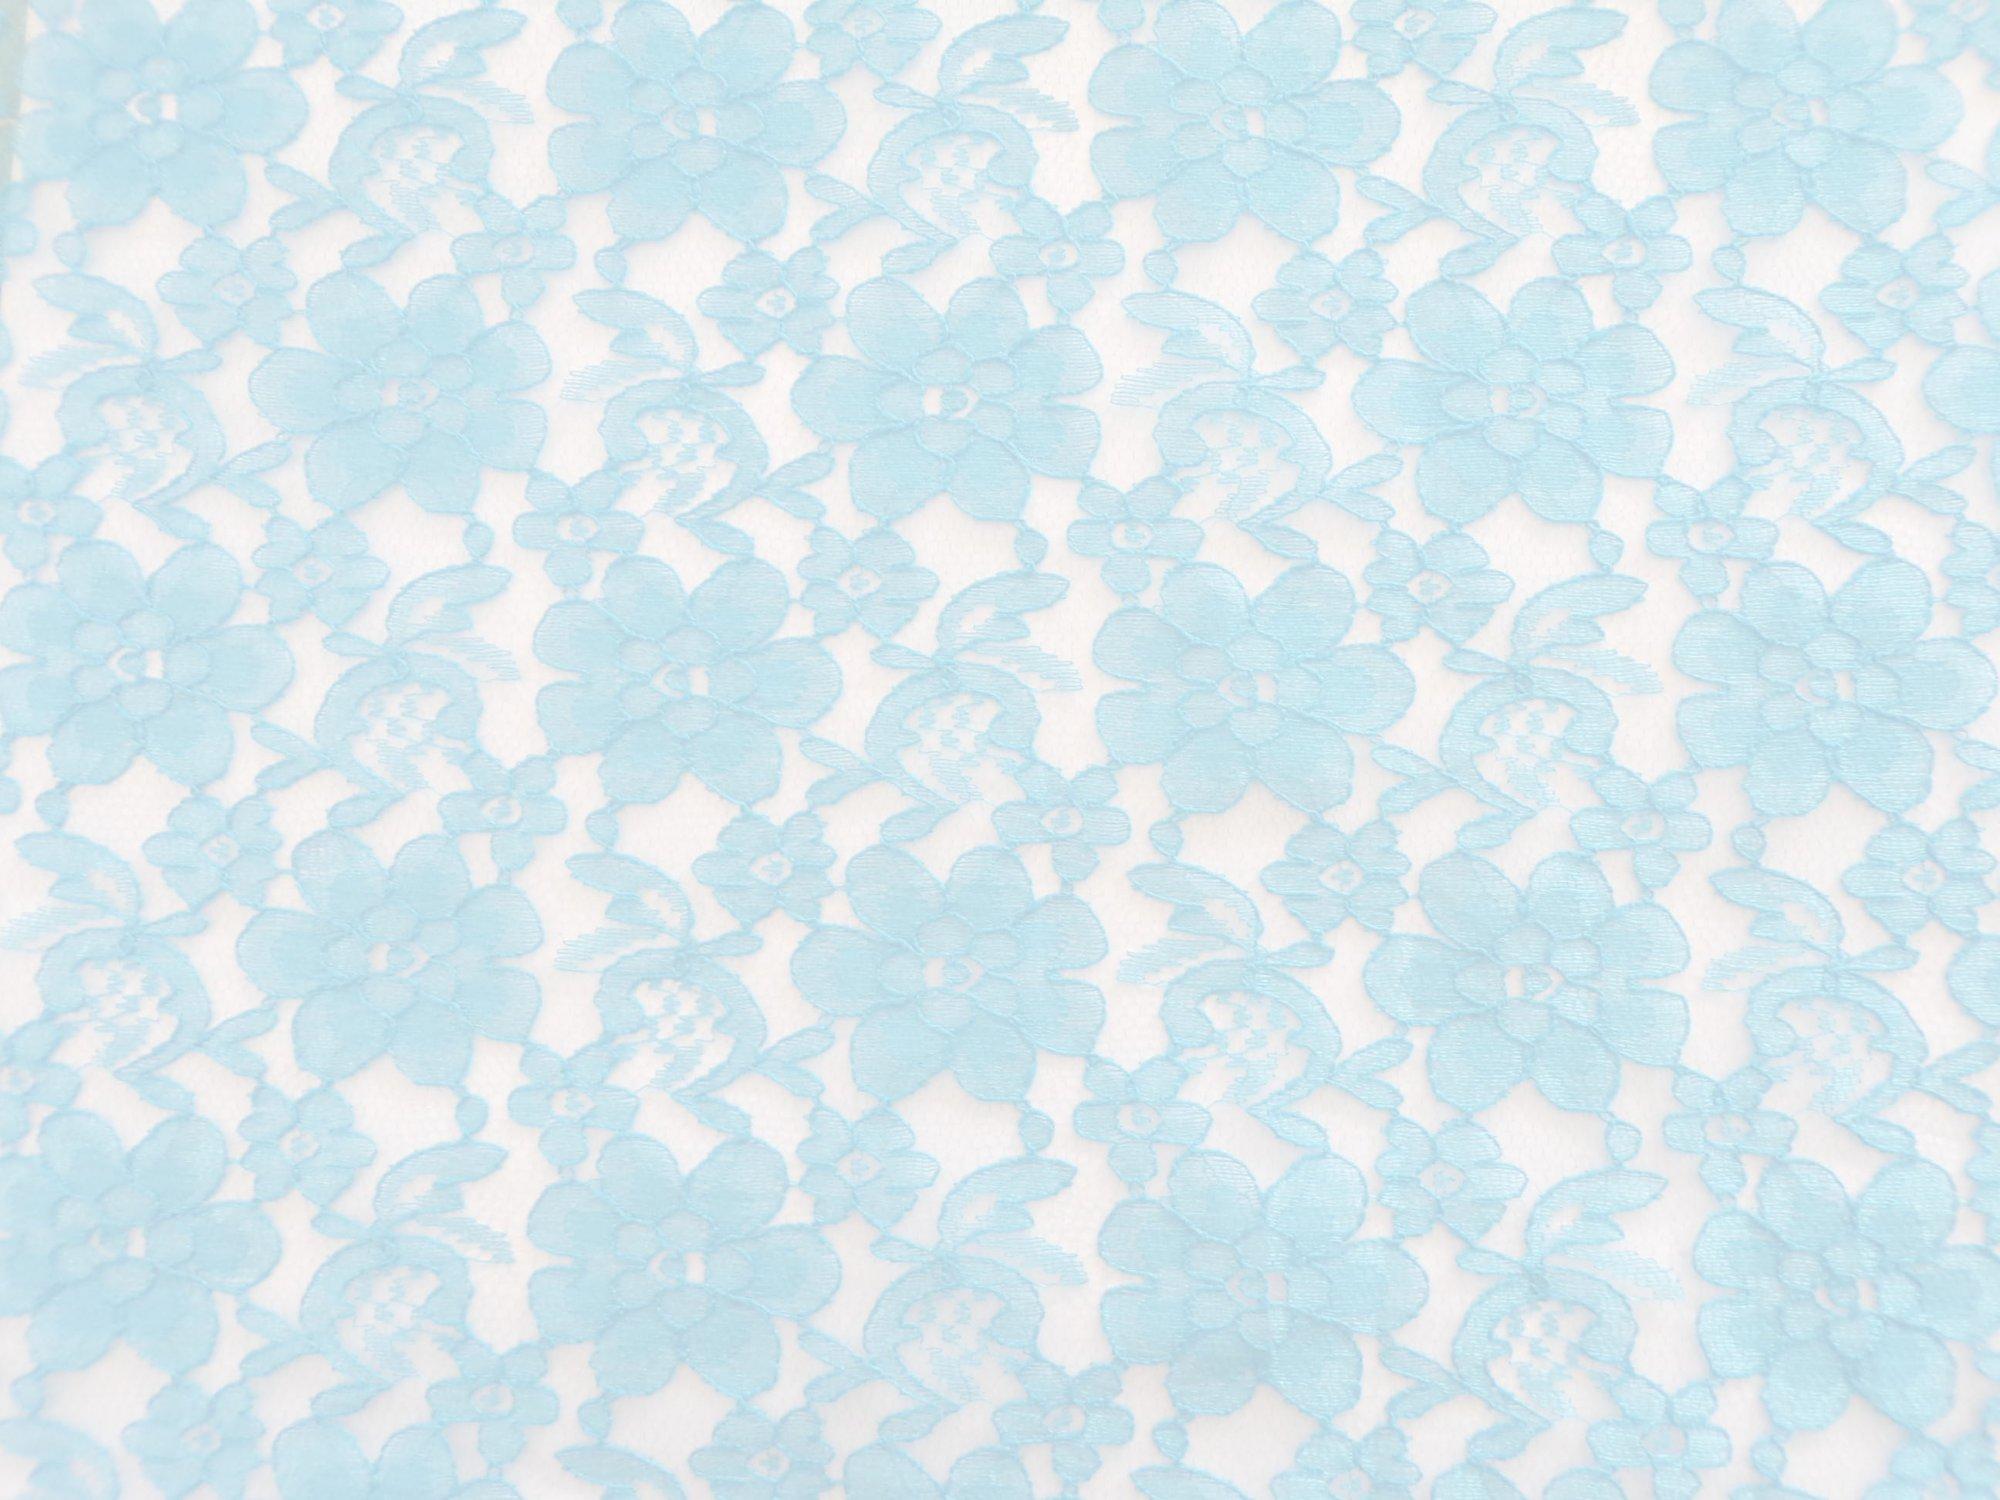 Raschel Lace - Light Blue